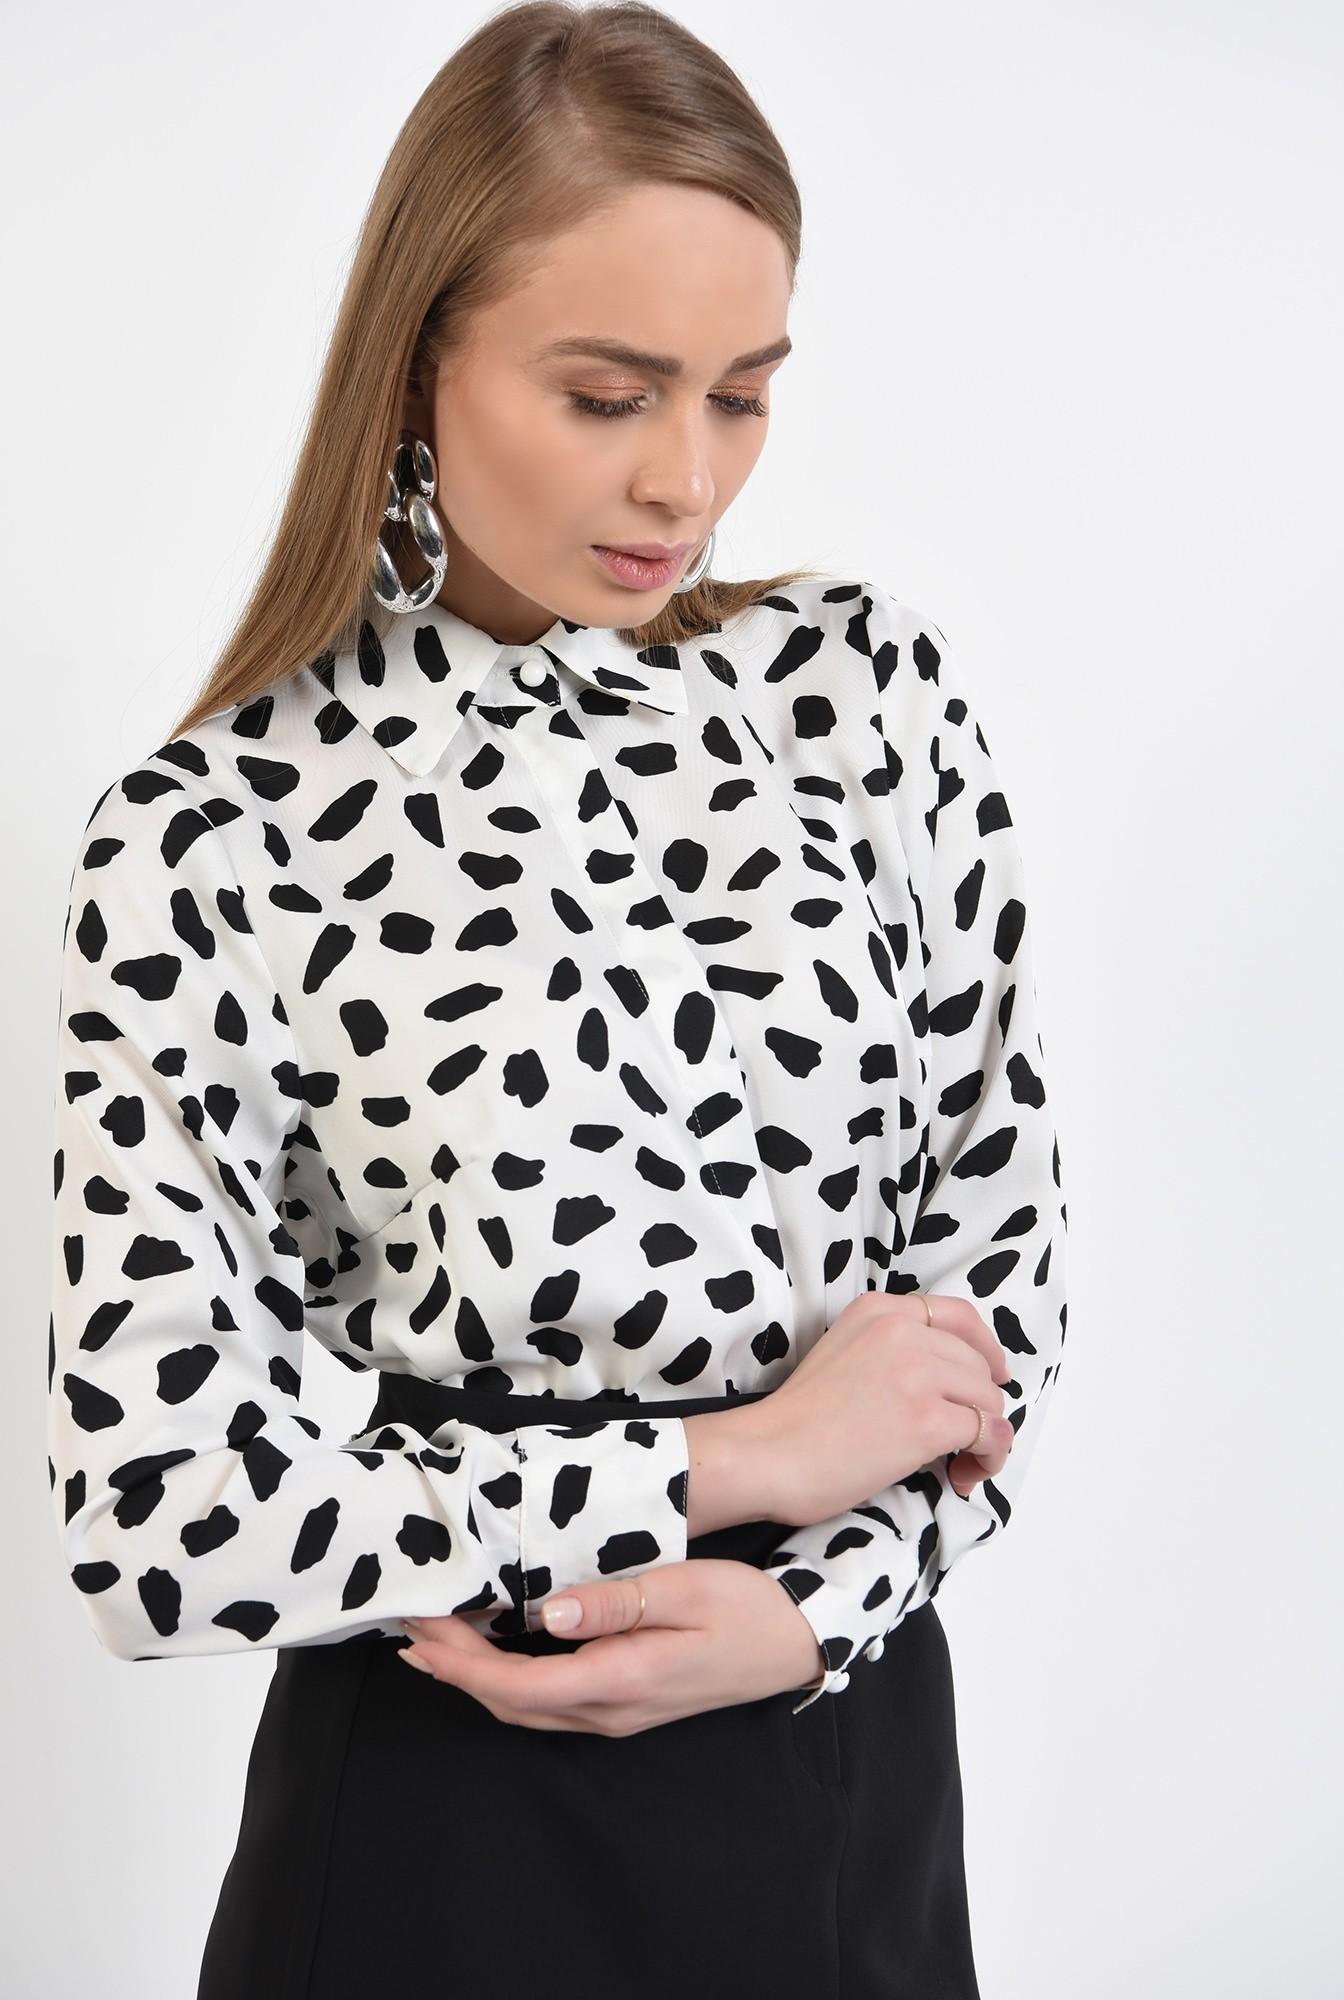 2 -  camasa cu imprimeu, din satin, alb-negru, camasa de primavara